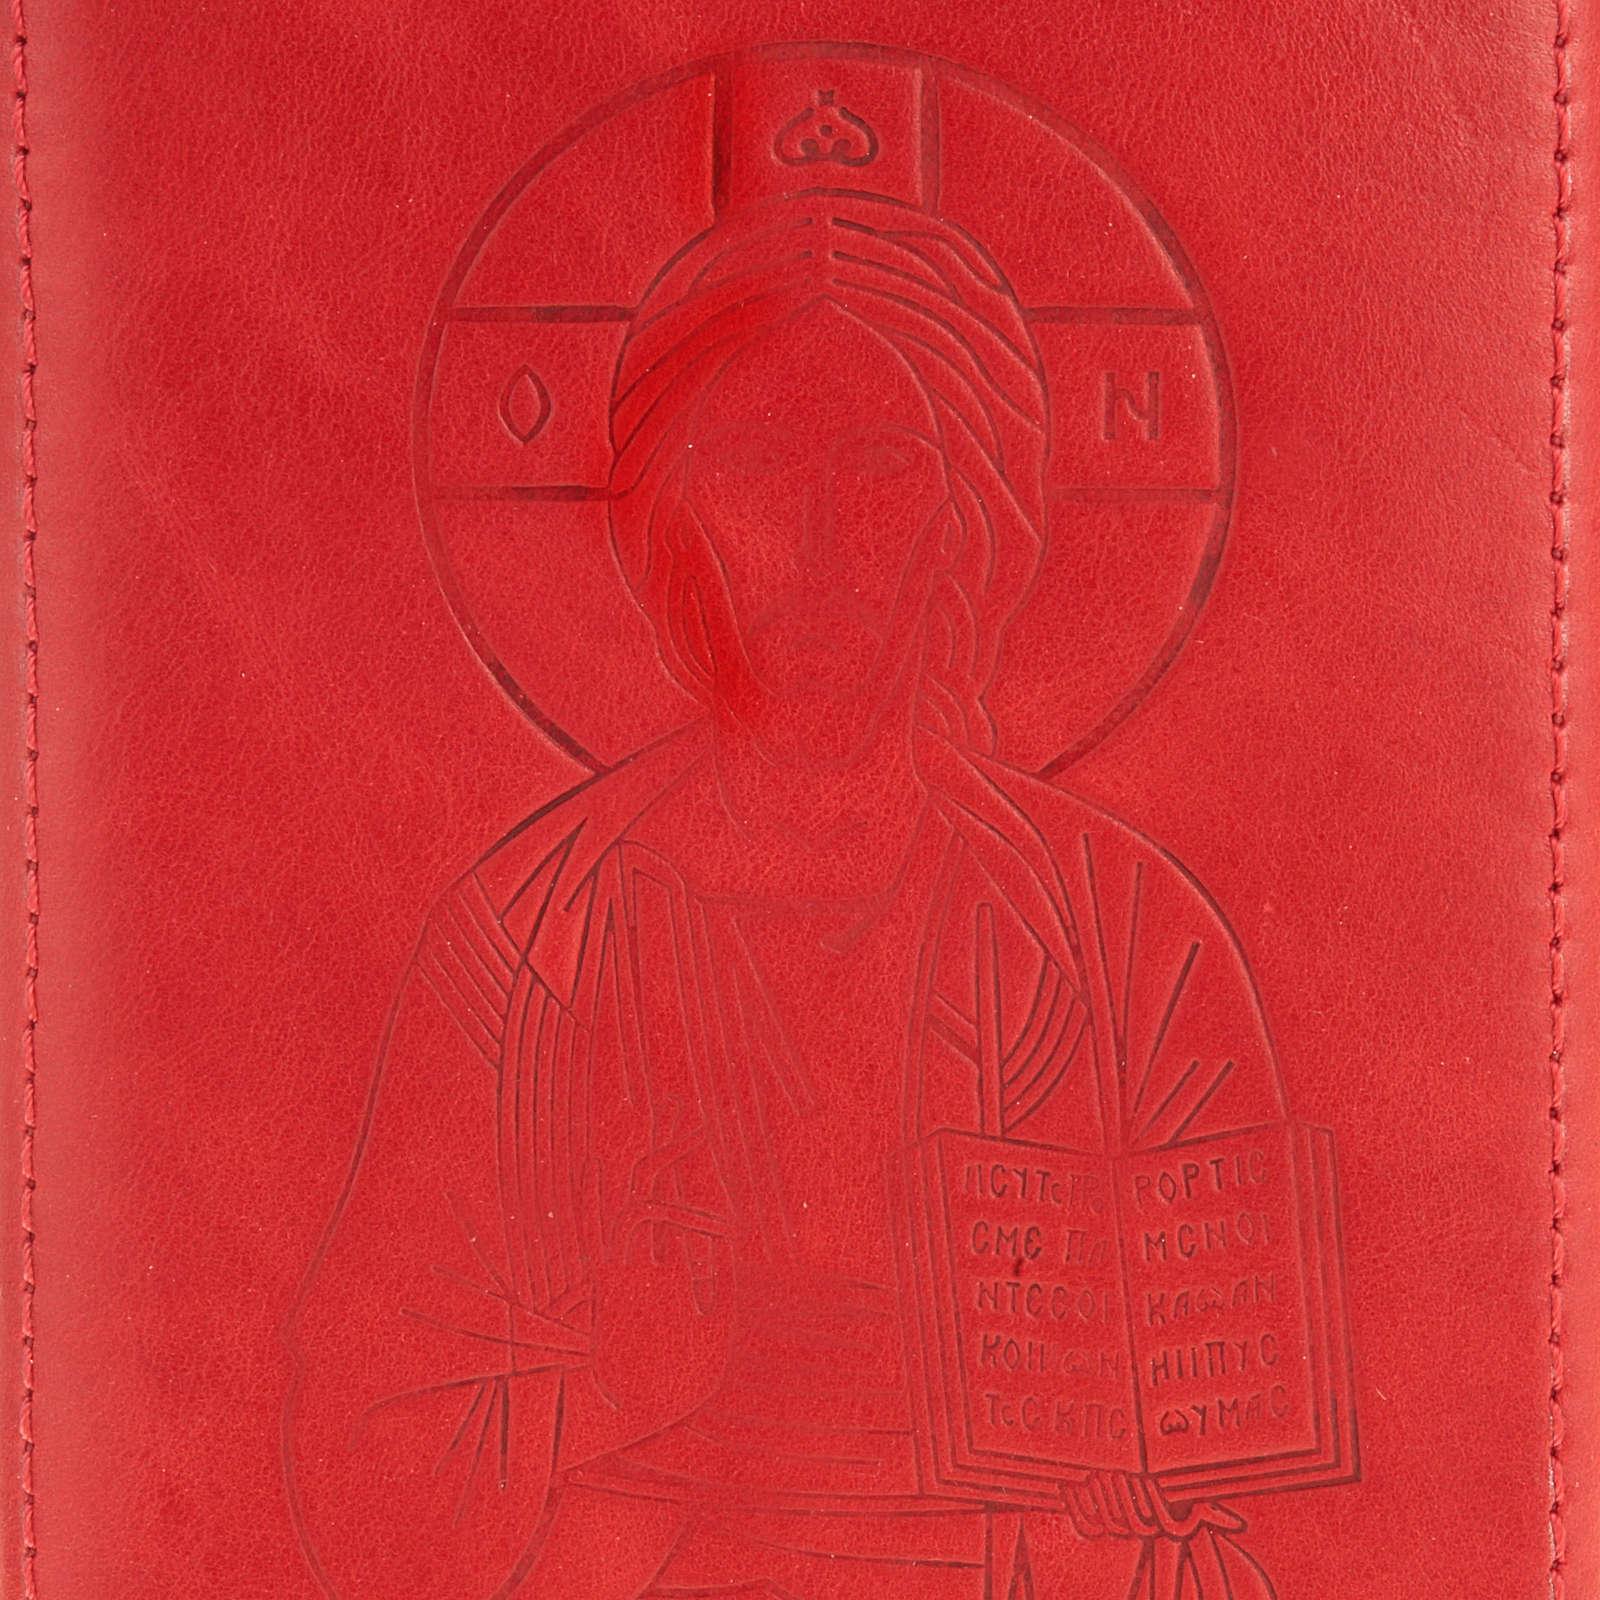 Copertina 4 vol. immagine, alfa omega 4